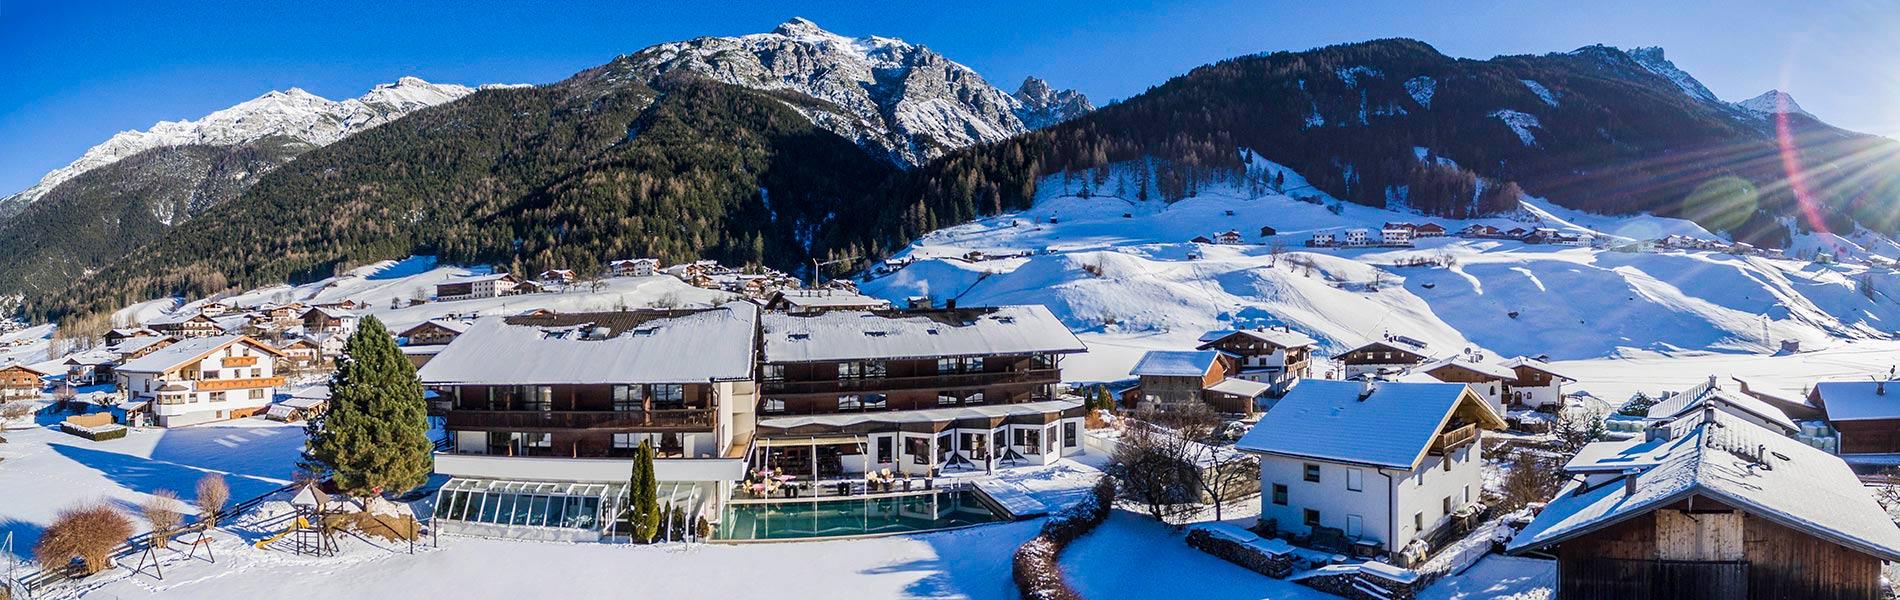 Happy Stubai Hotel Neustift Tirol Austria Hostel Winterurlaub im Stubaital